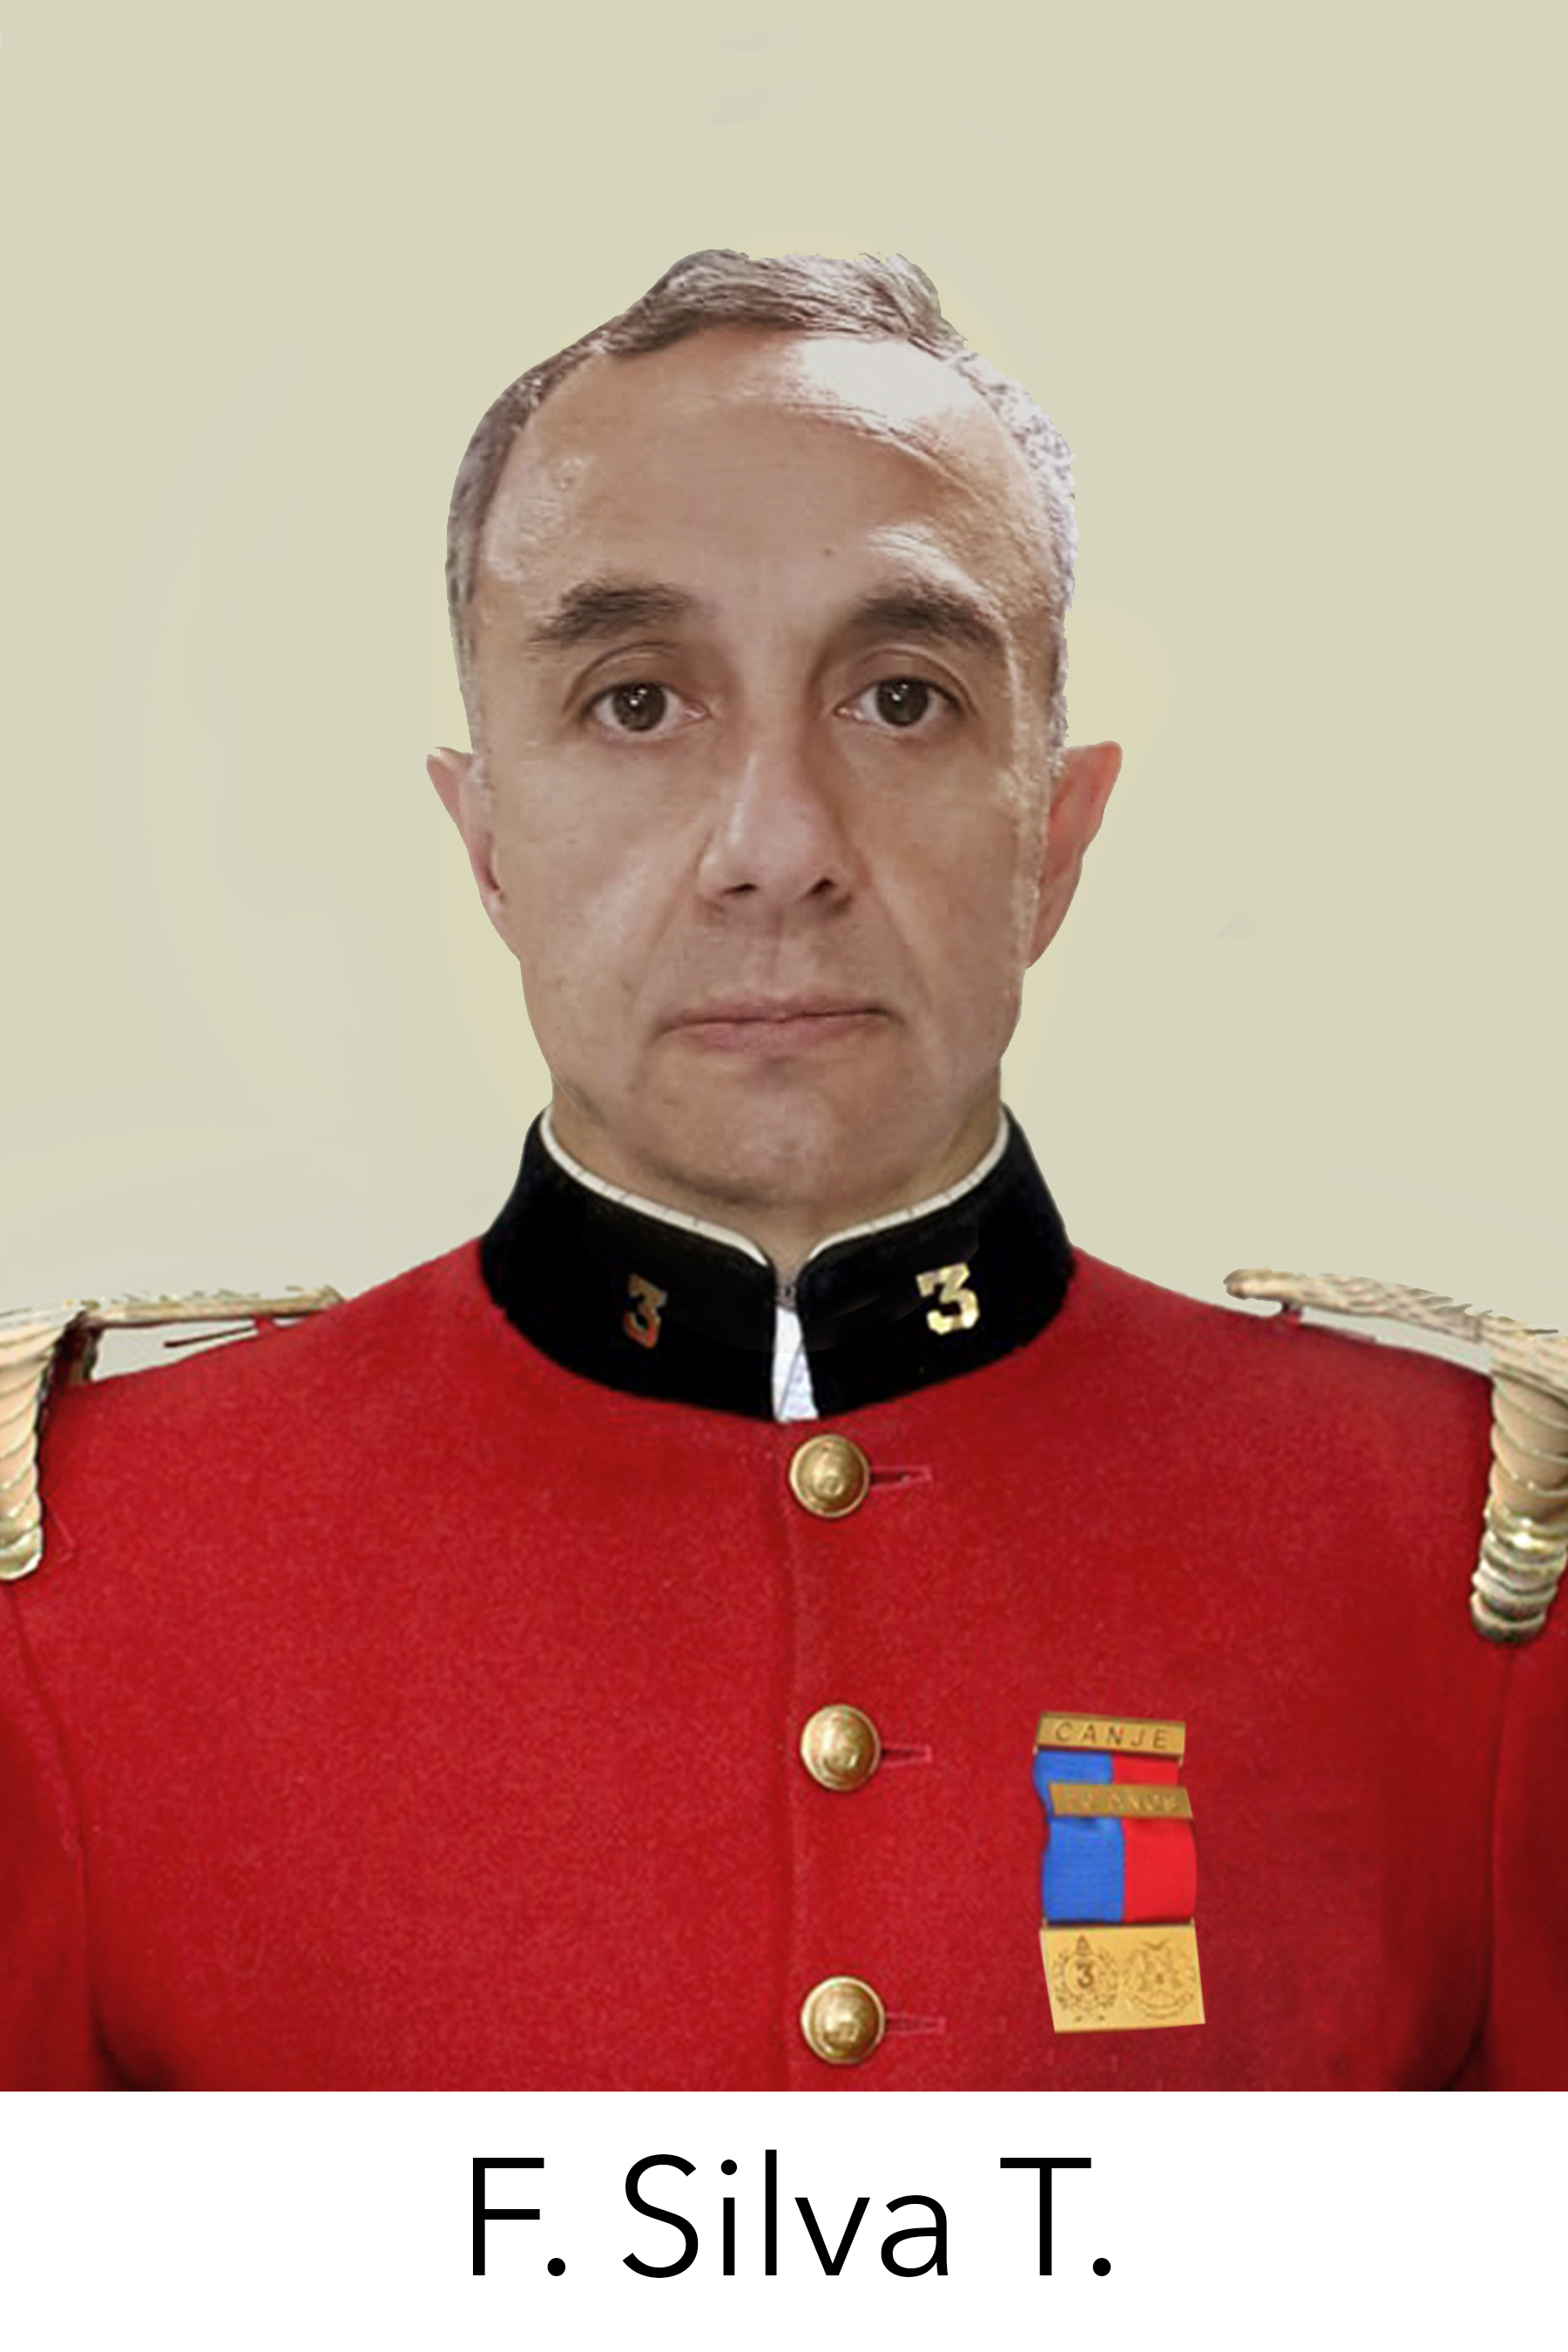 Francisco Silva Teran